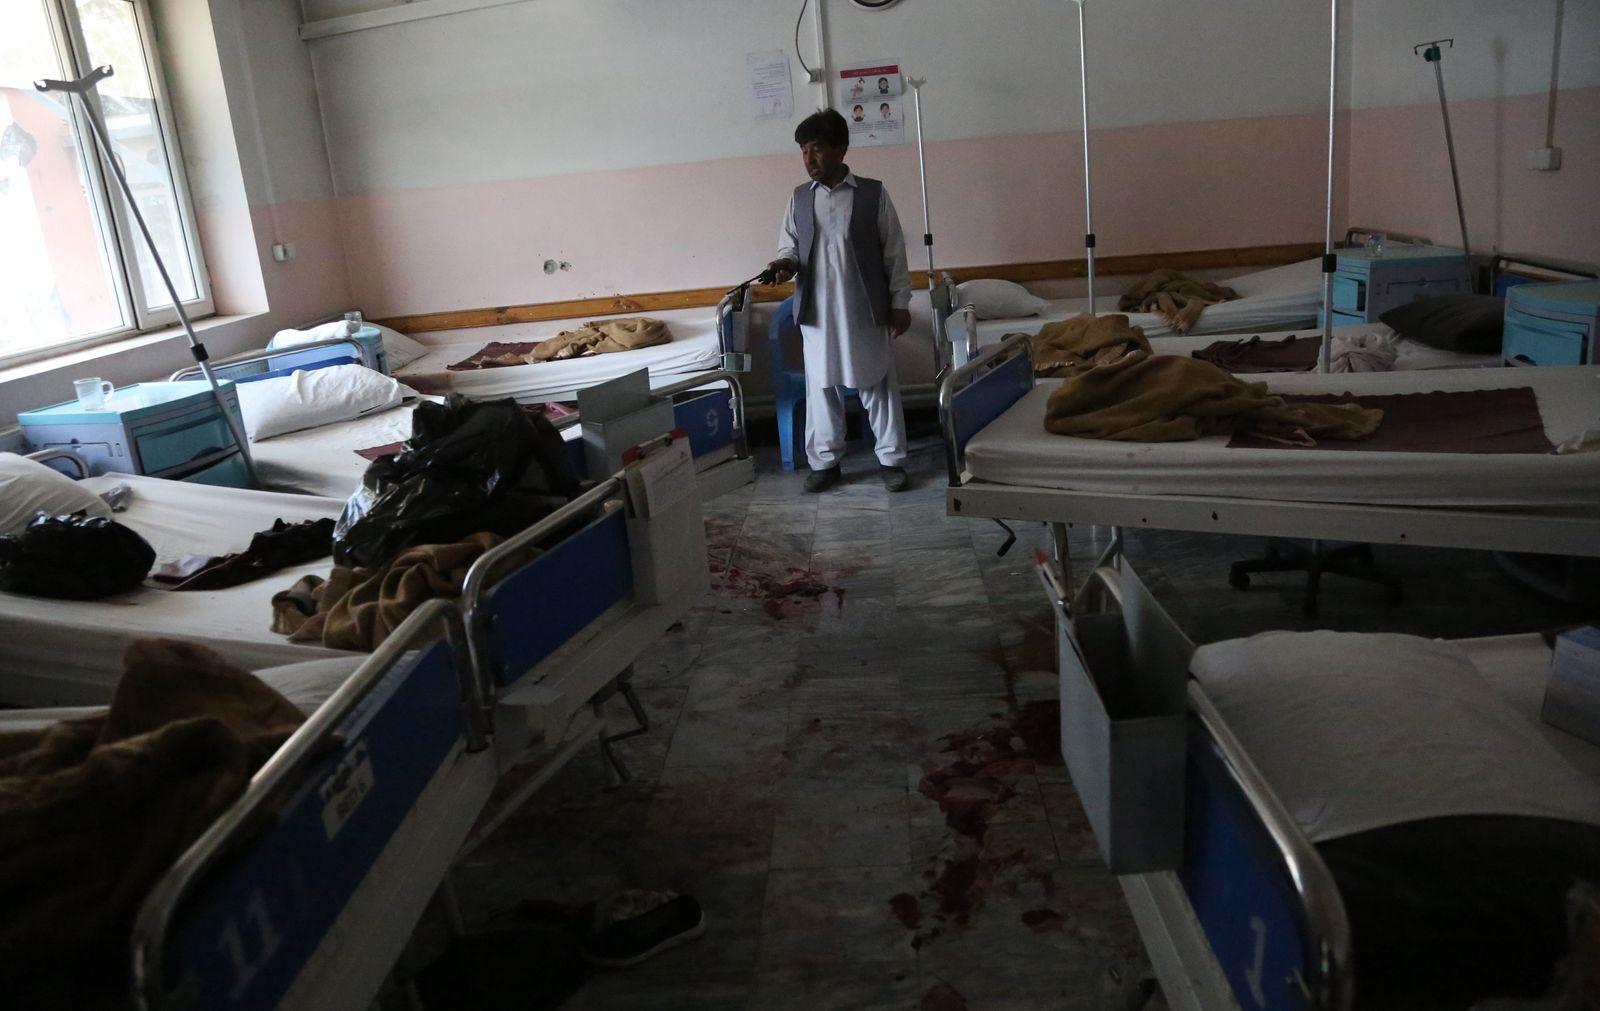 Angriff auf Krankenhaus in Kabul